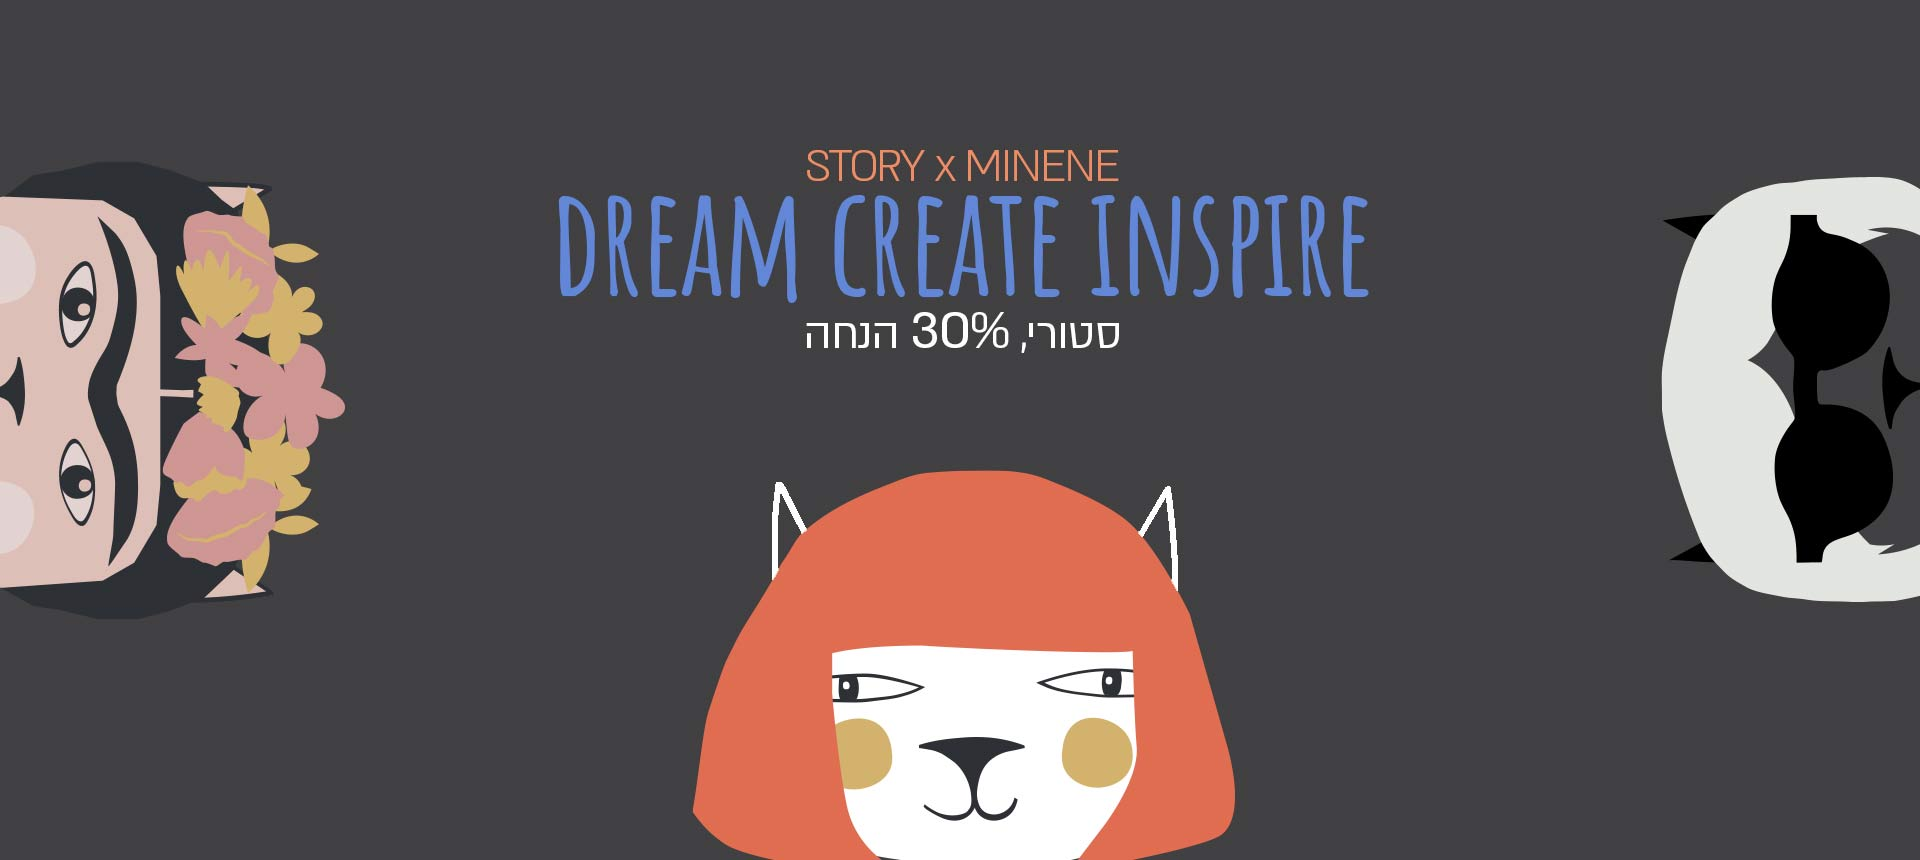 STORY X MINENE DREAM CREATE INSPIRE סטורי, 30% הנחה